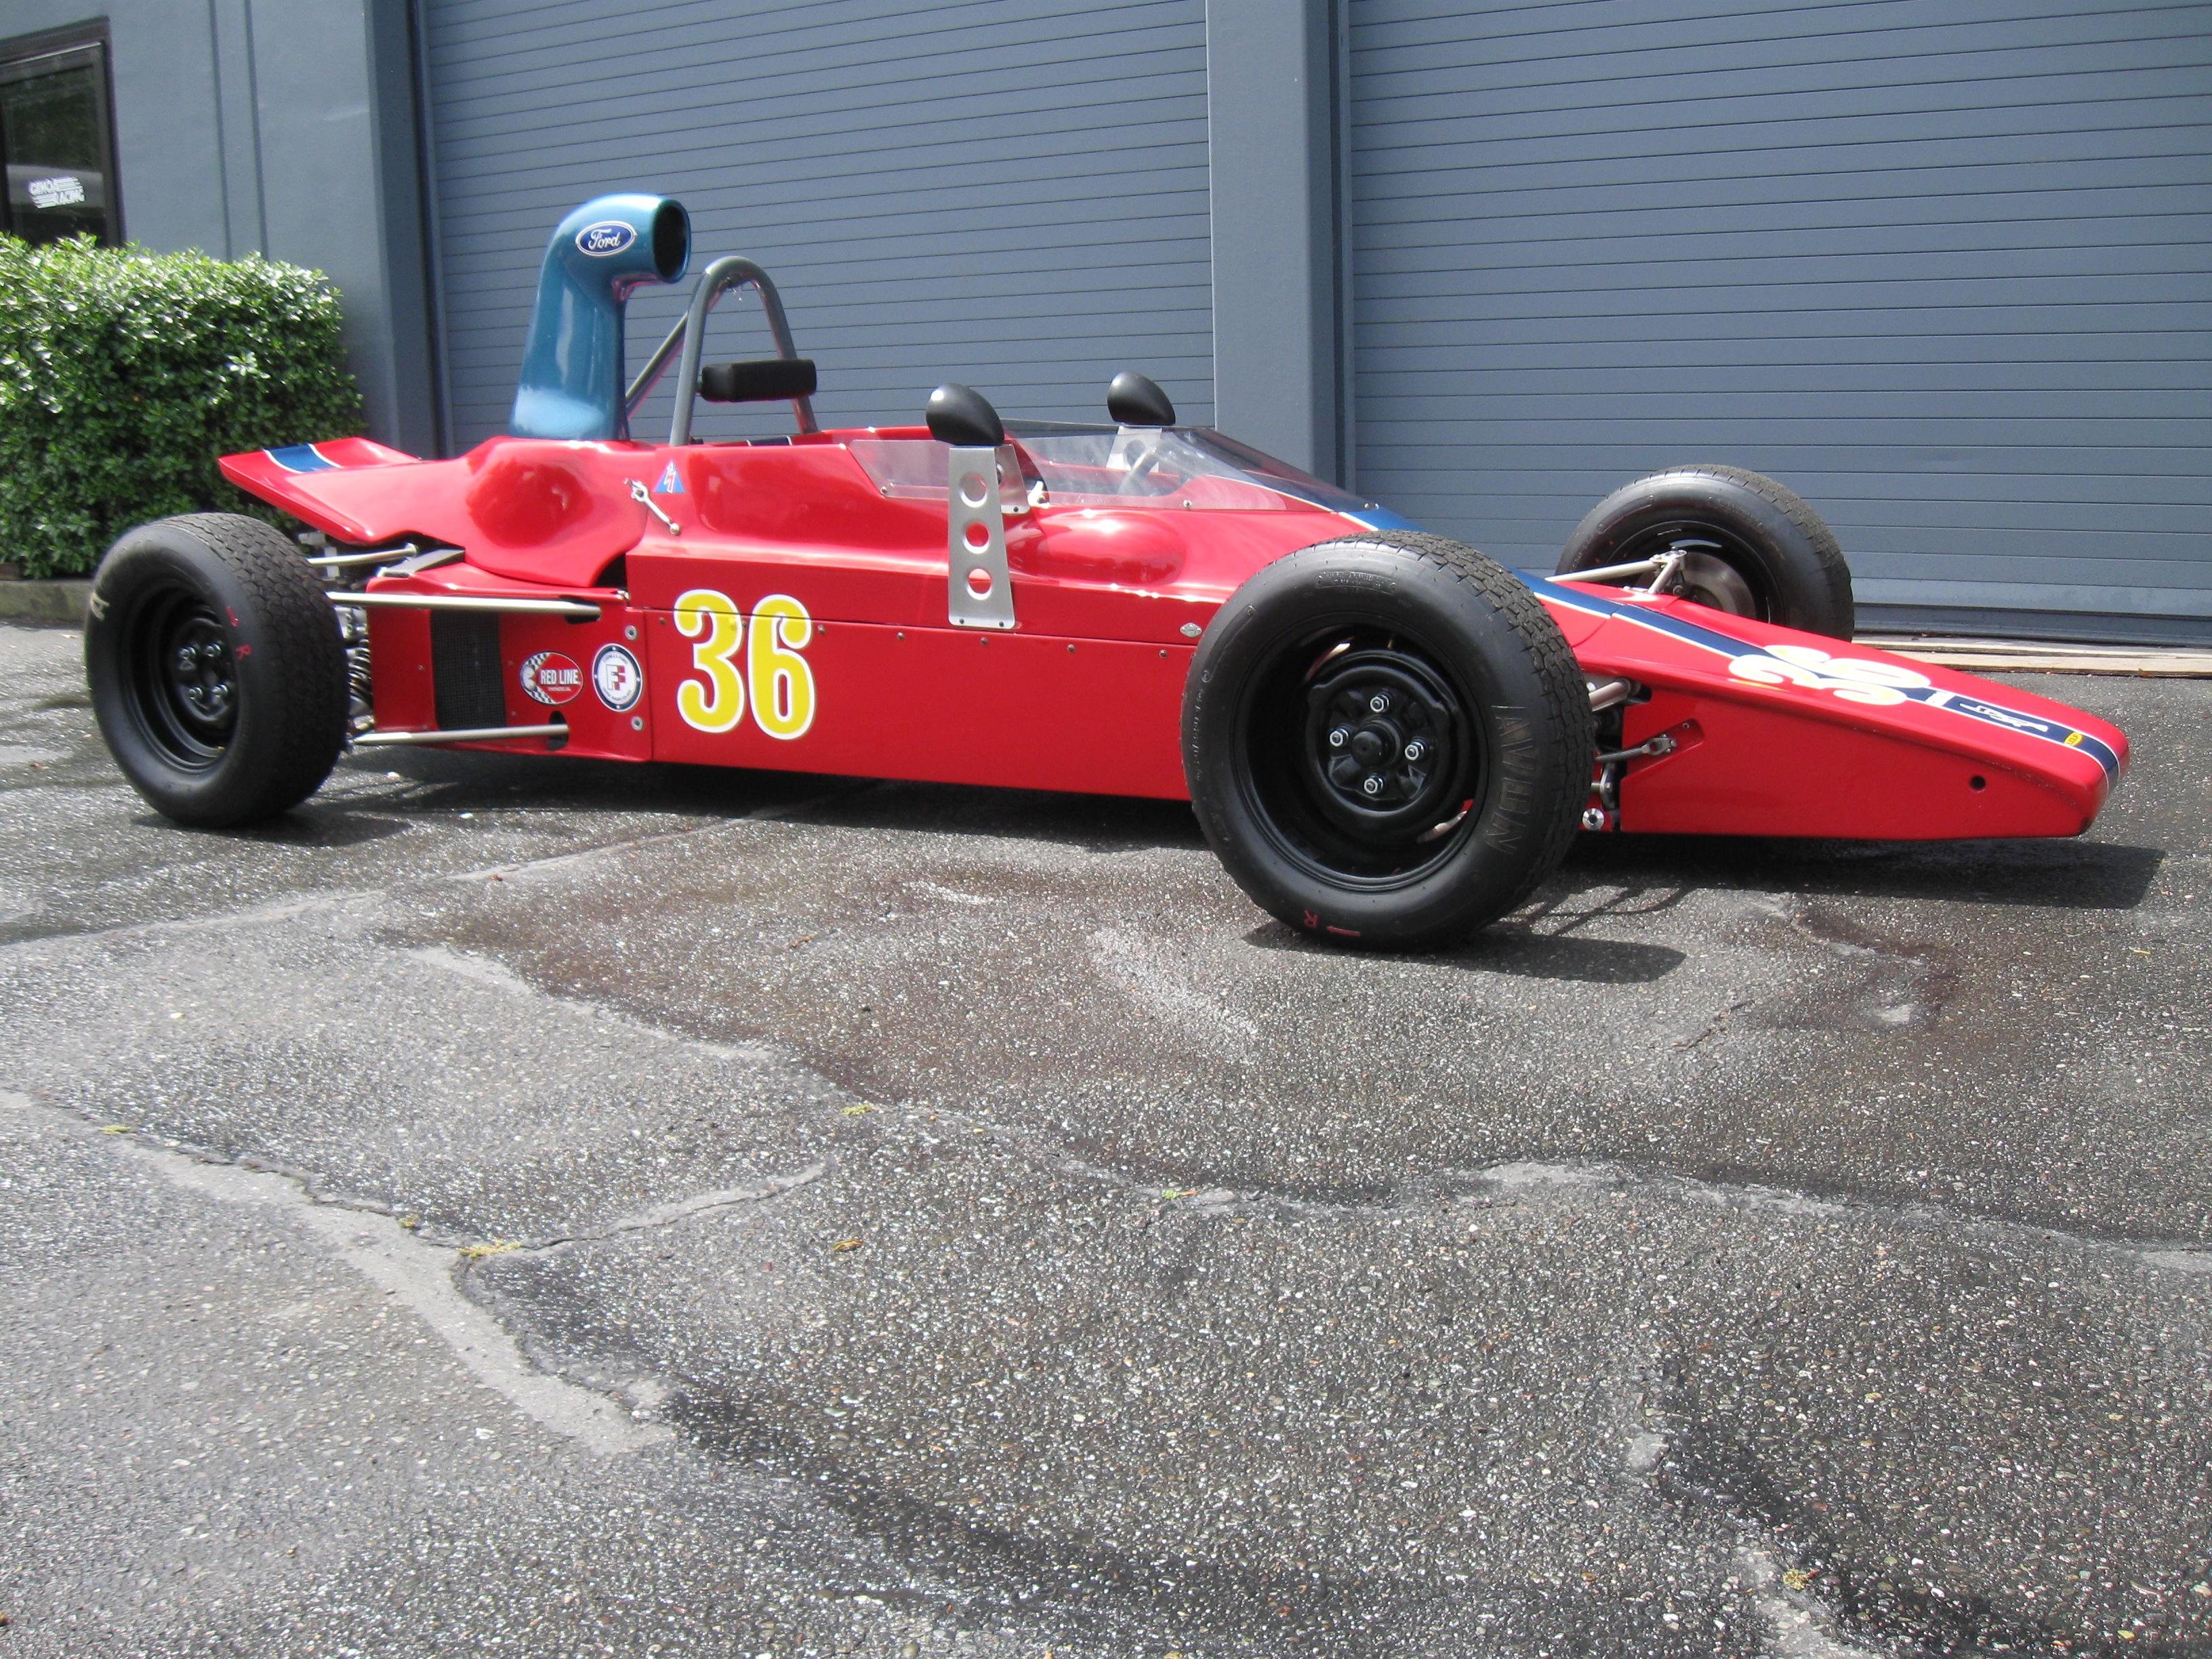 1978 Lola T342 Formula Ford - Motorsports Market